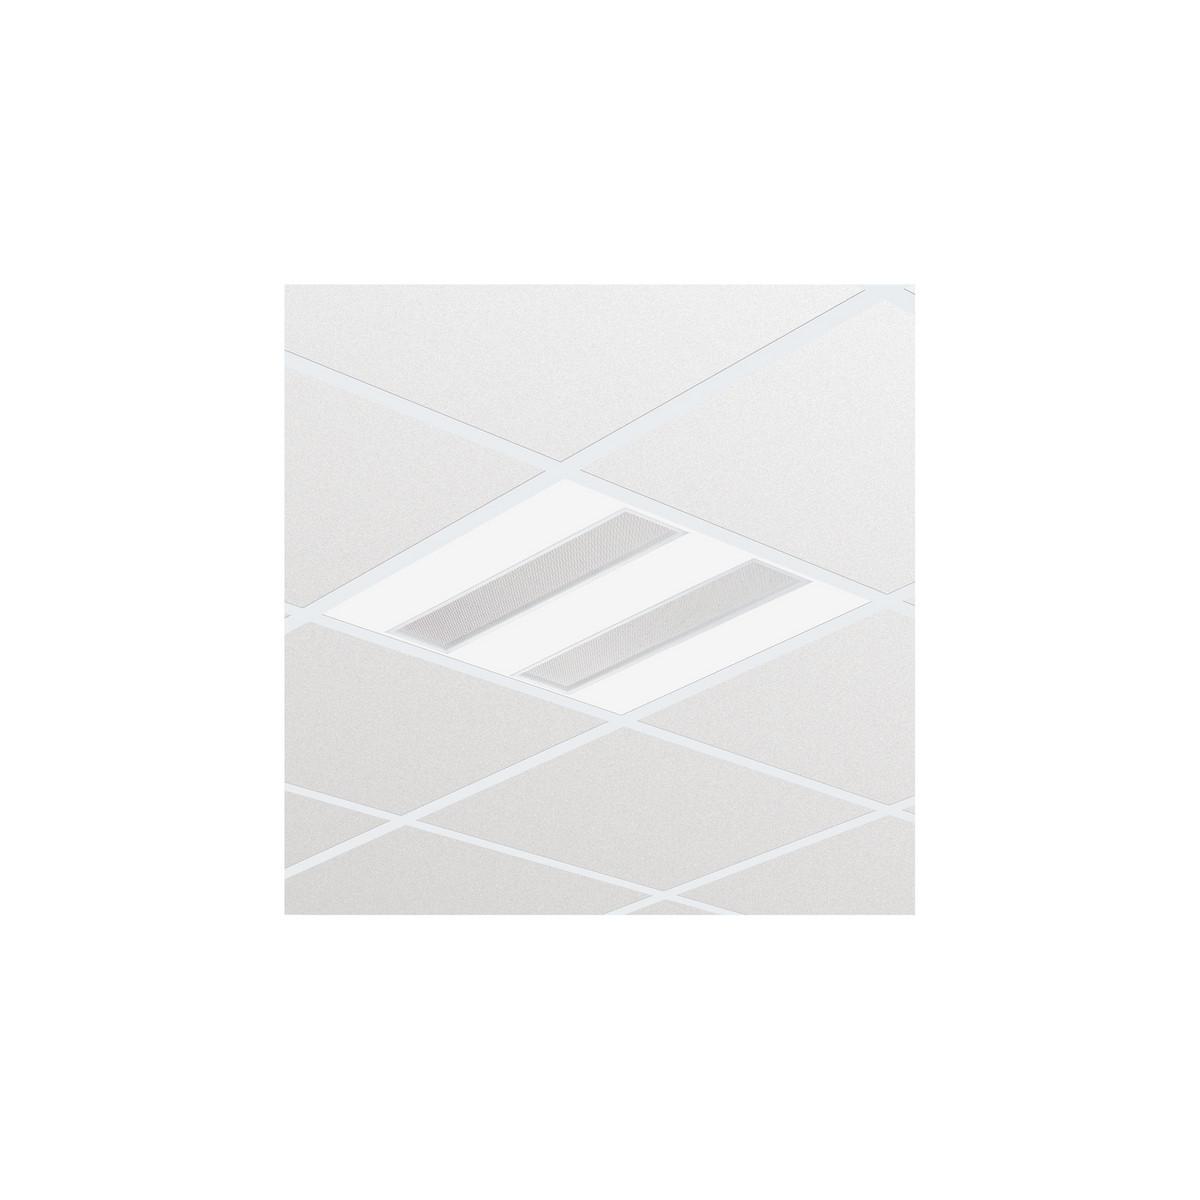 Philips FlexBlend Indbyg RC340B 3600lm/940 60x60 Synlig T-skinne MLO-optik SpaceWise